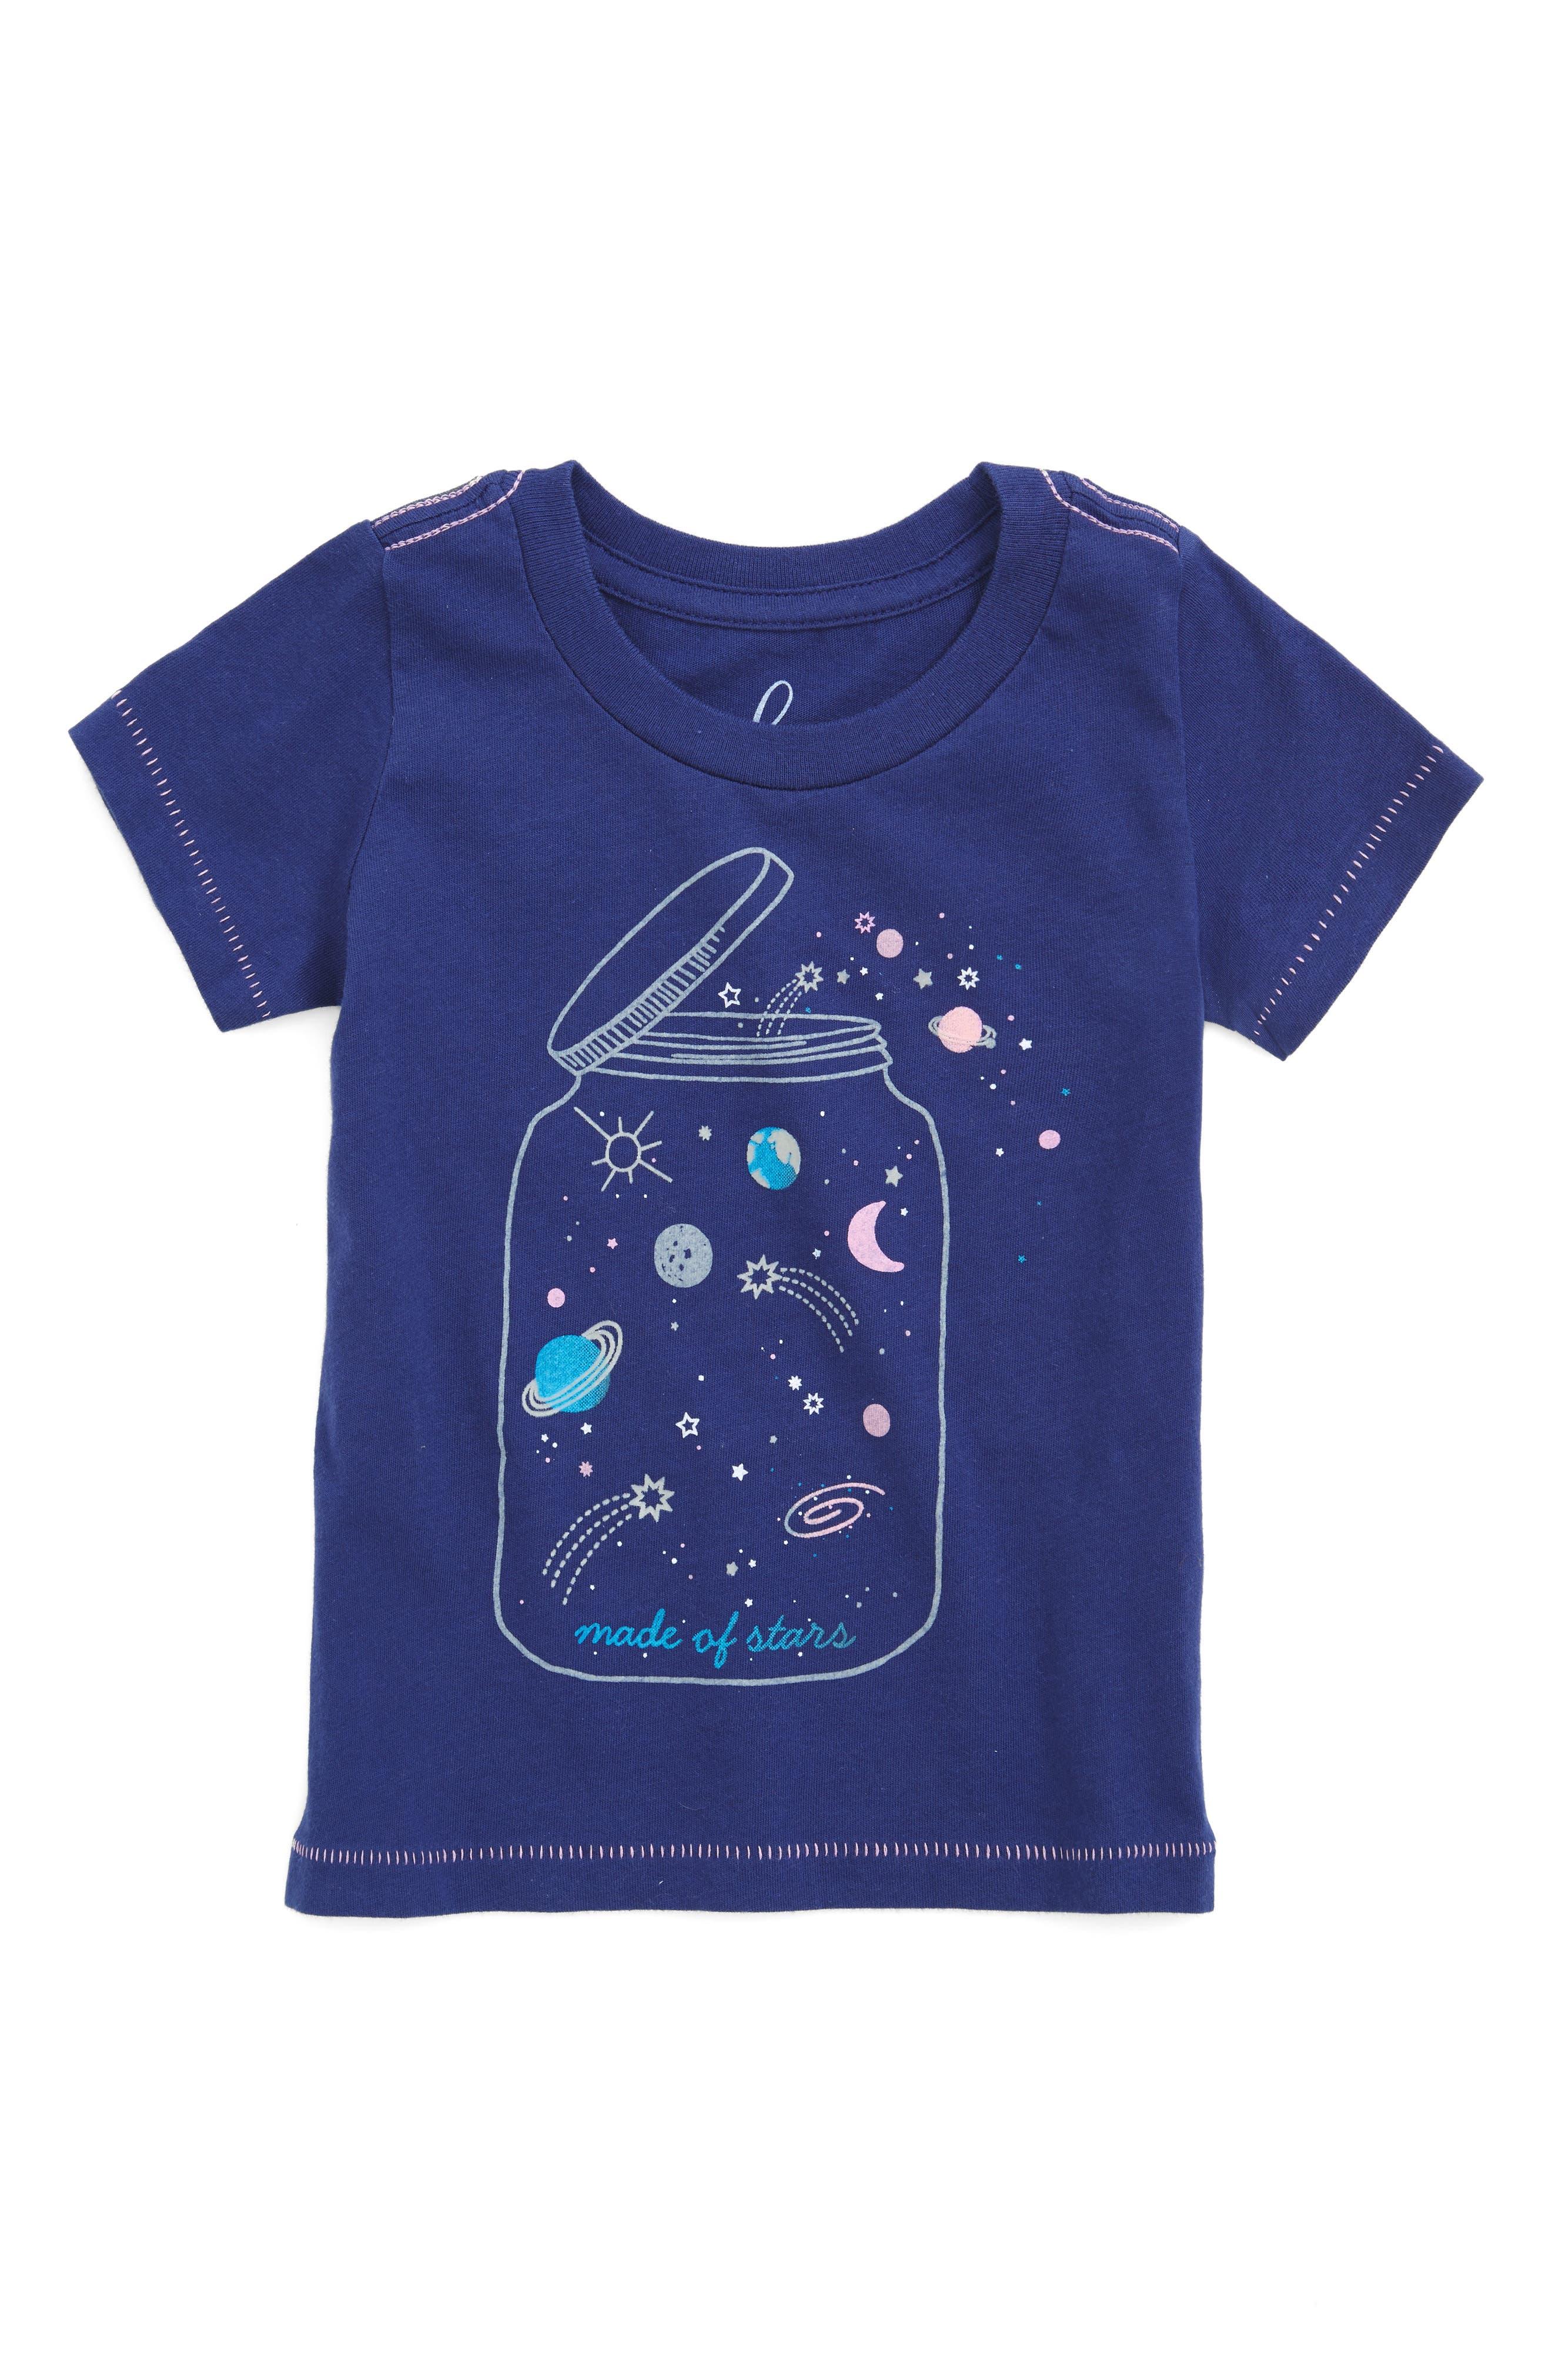 Jar of Stars Graphic Tee,                         Main,                         color, 410